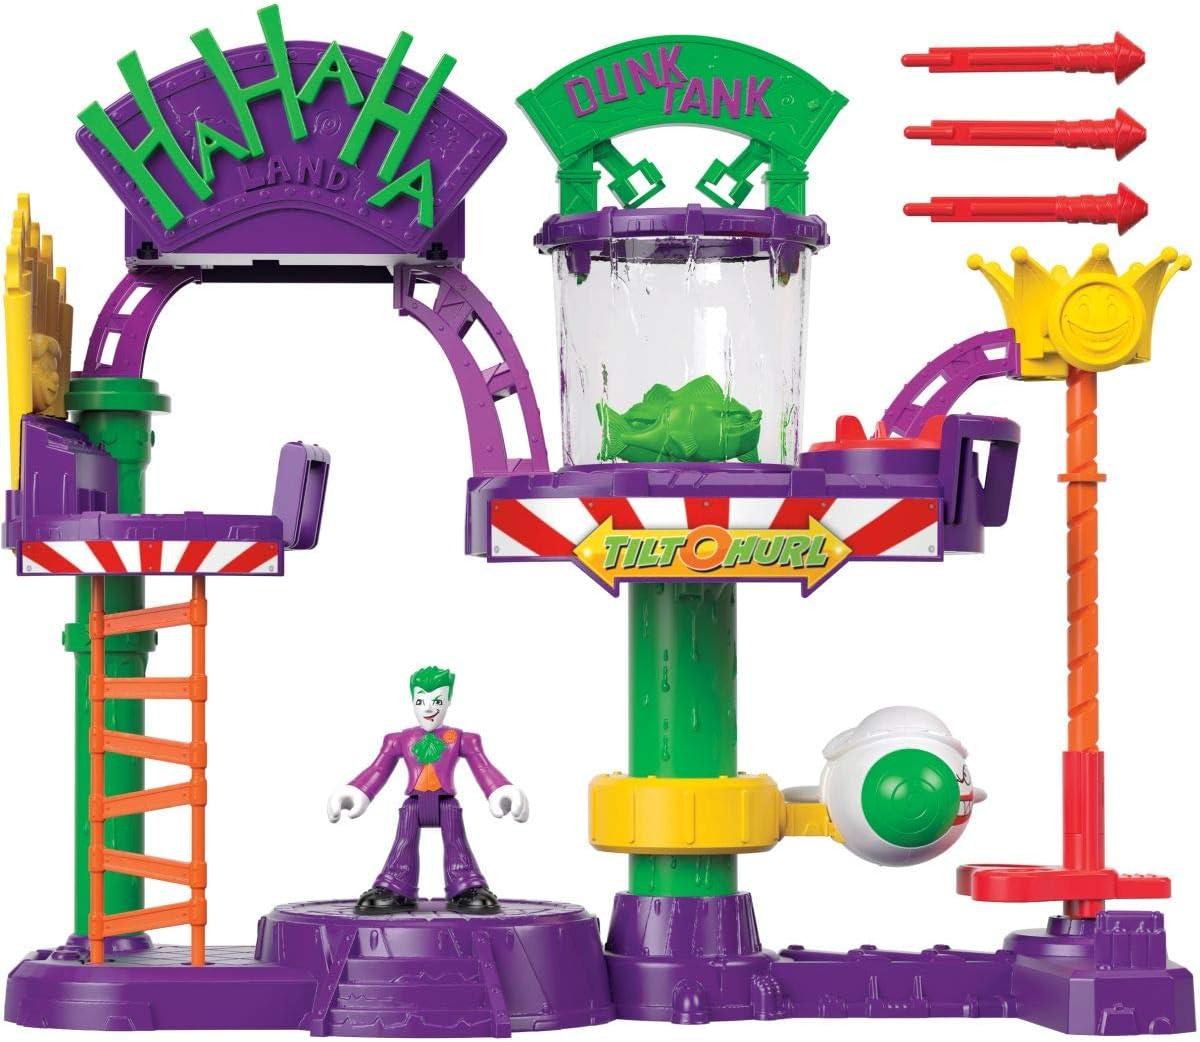 Fisher Price DC Super Friends Imaginext Joker Laff Factory